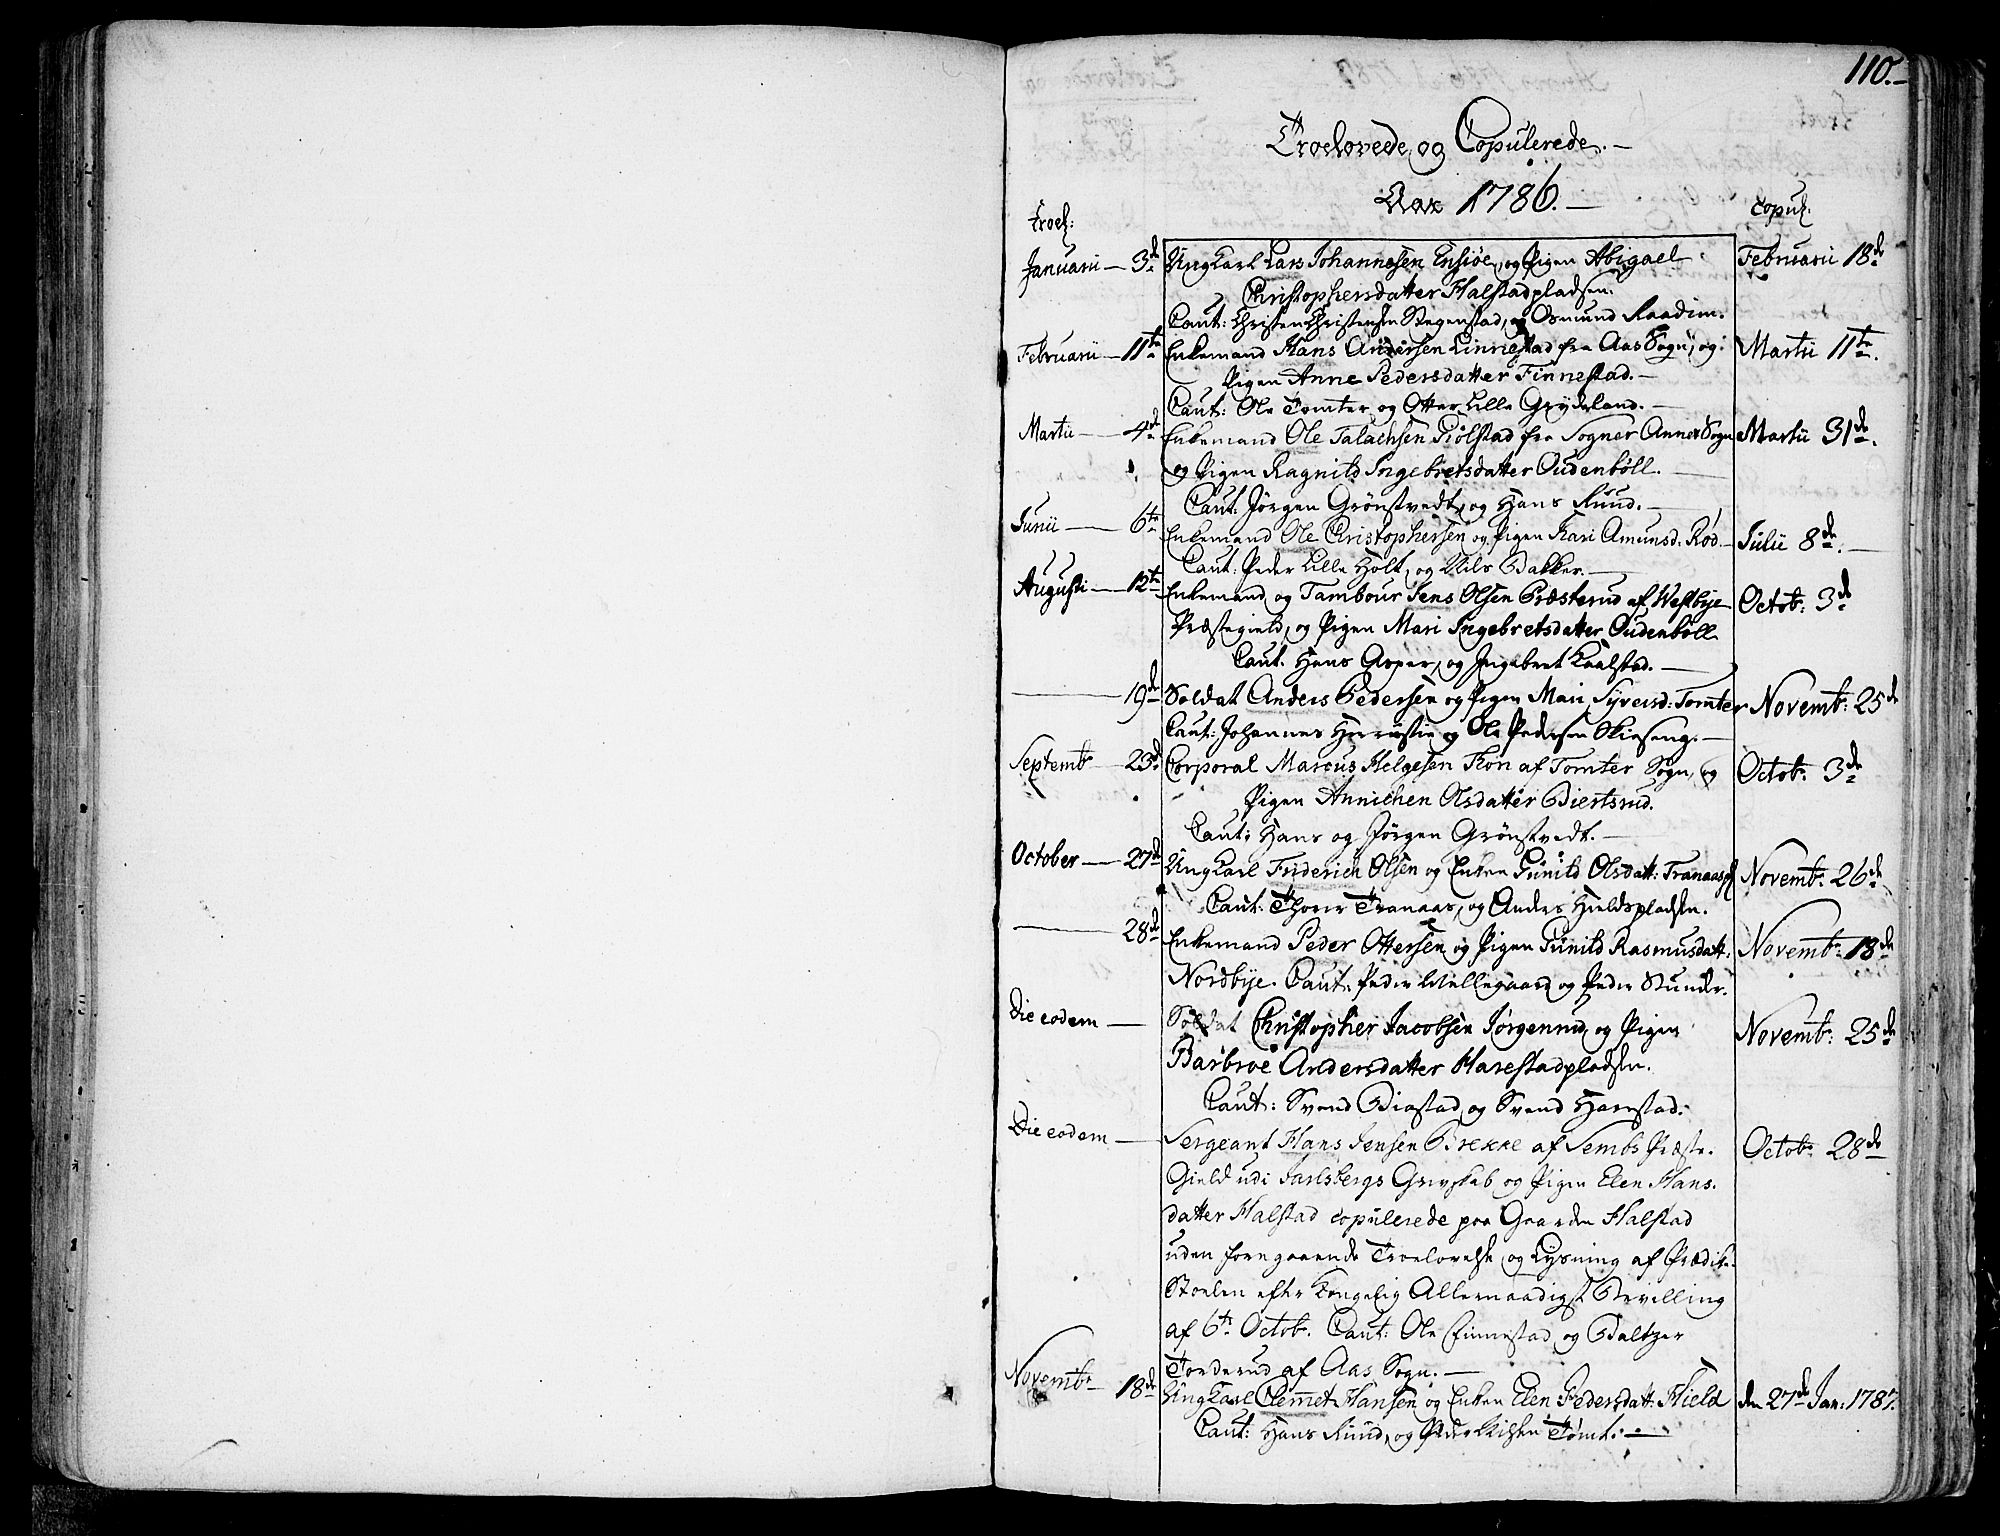 SAO, Kråkstad prestekontor Kirkebøker, F/Fa/L0002: Ministerialbok nr. I 2, 1786-1814, s. 110